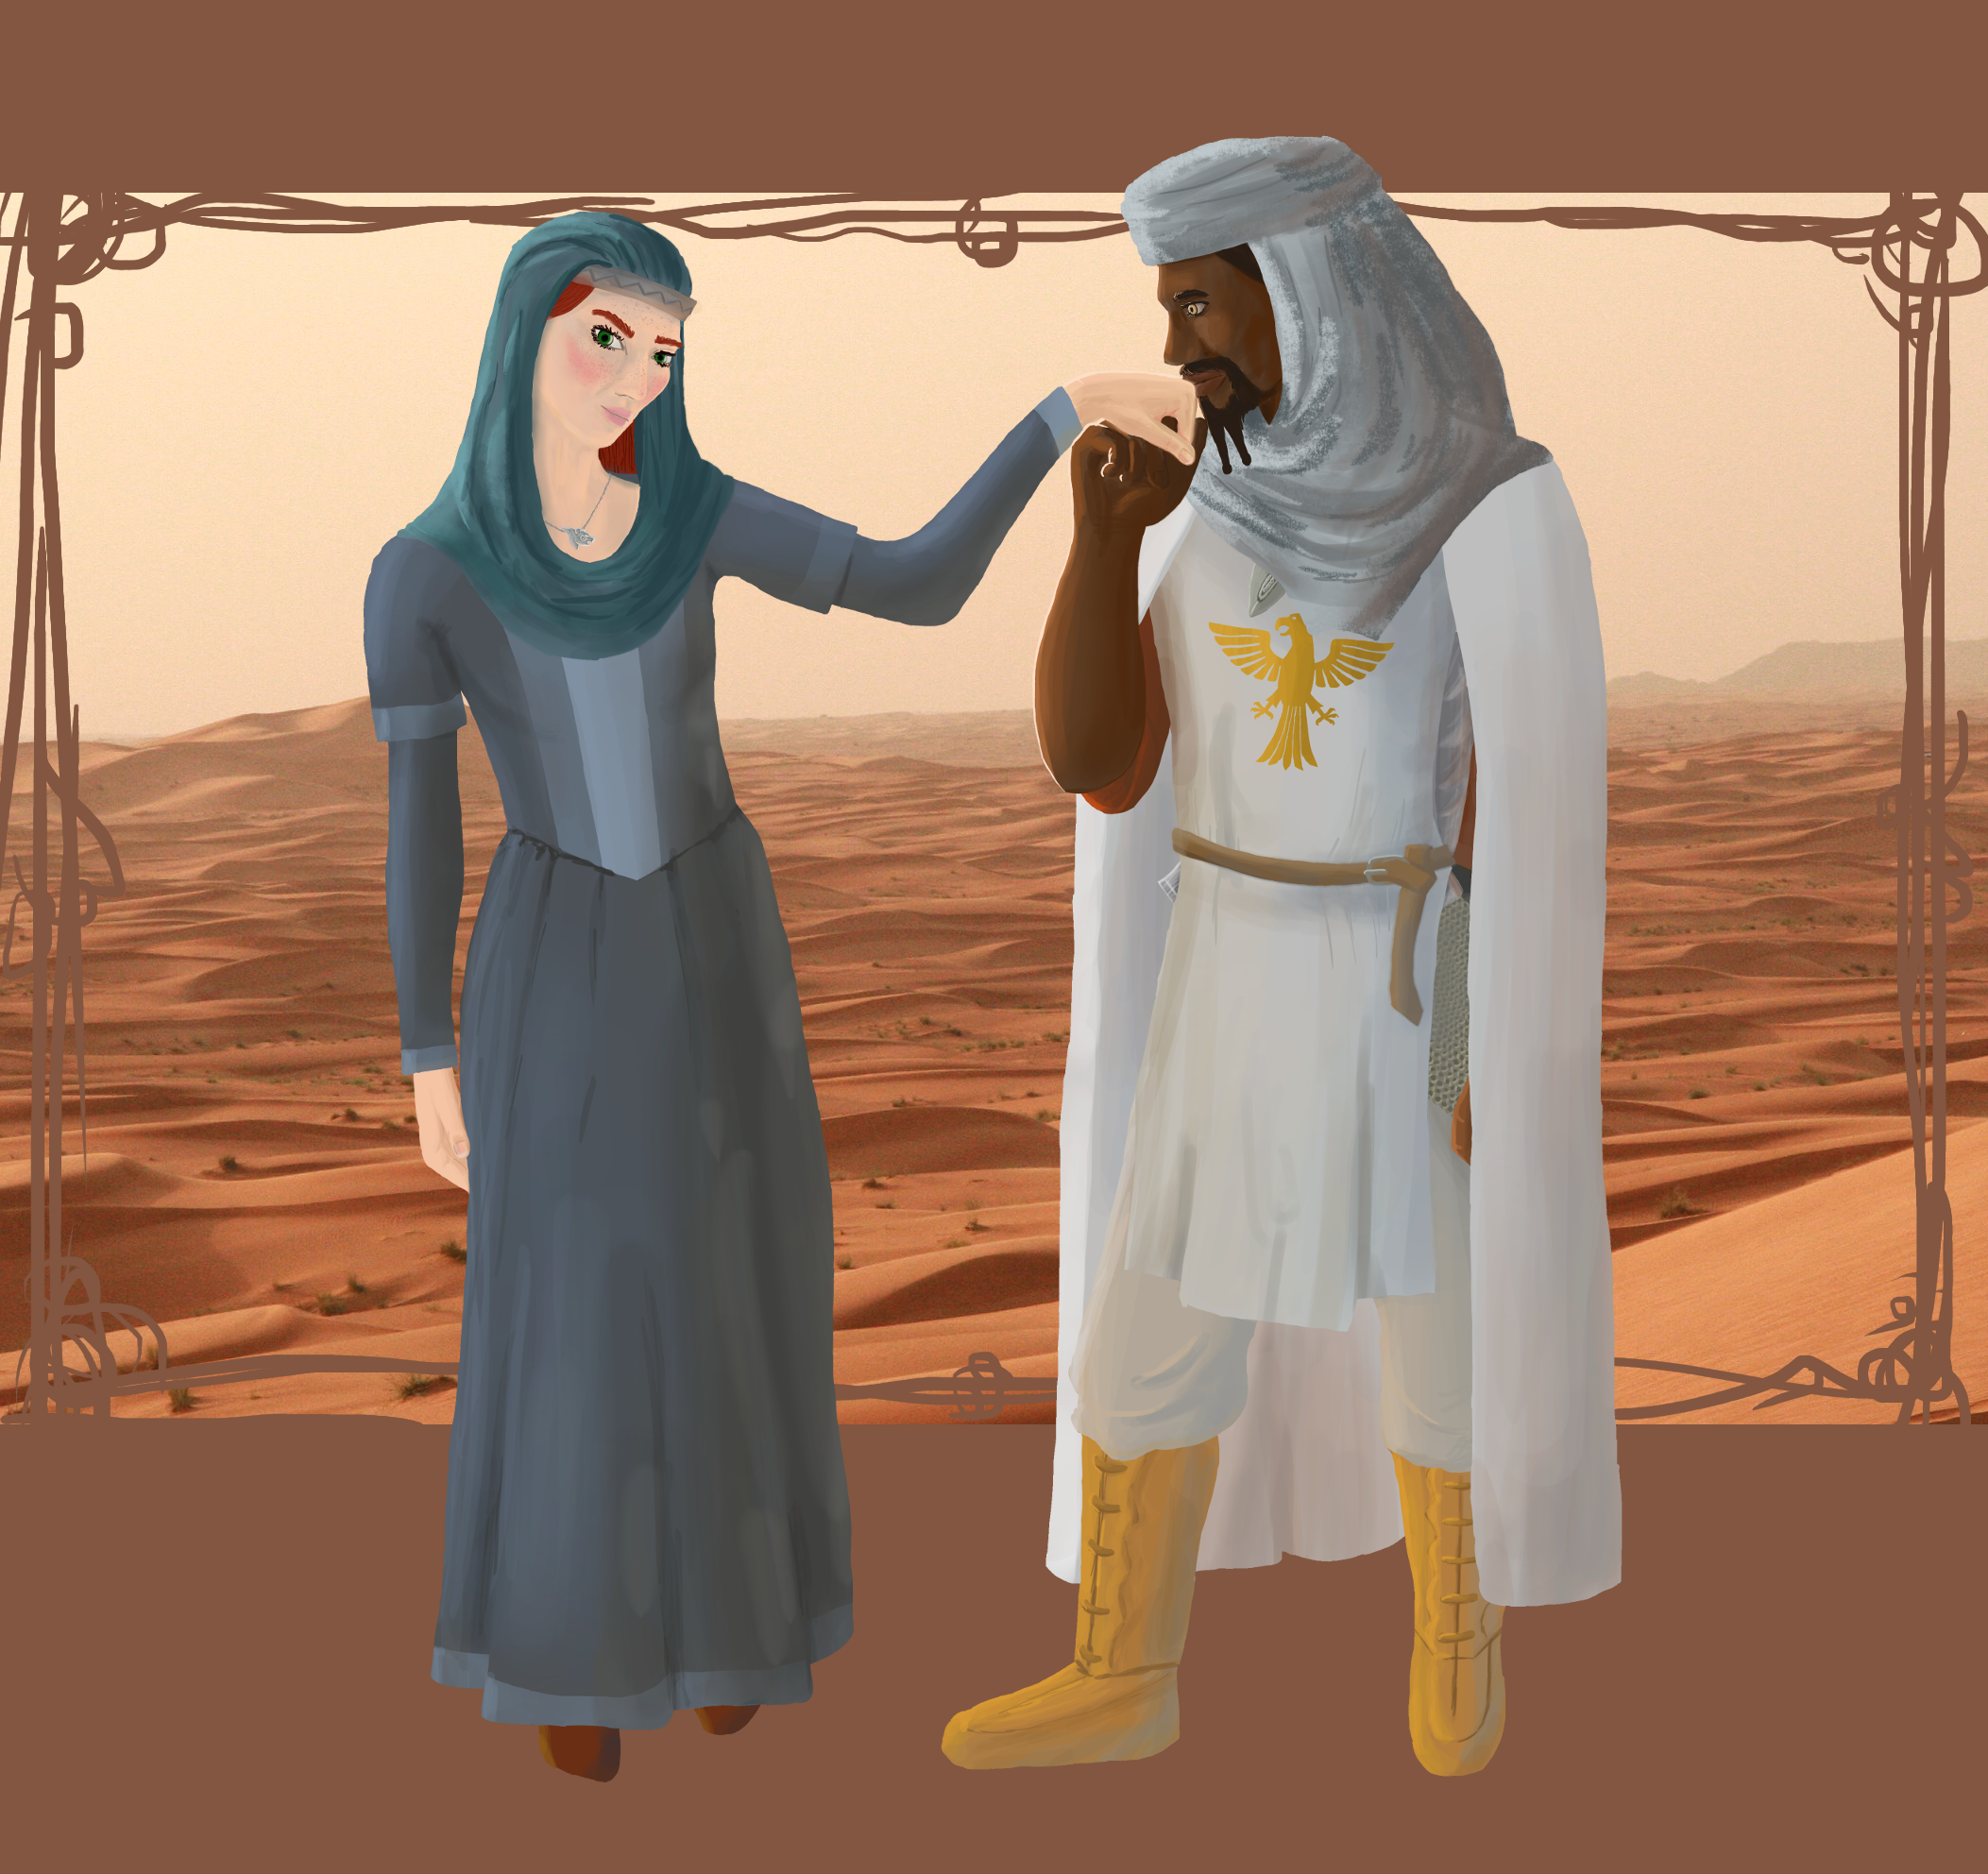 Hroda and Casimir